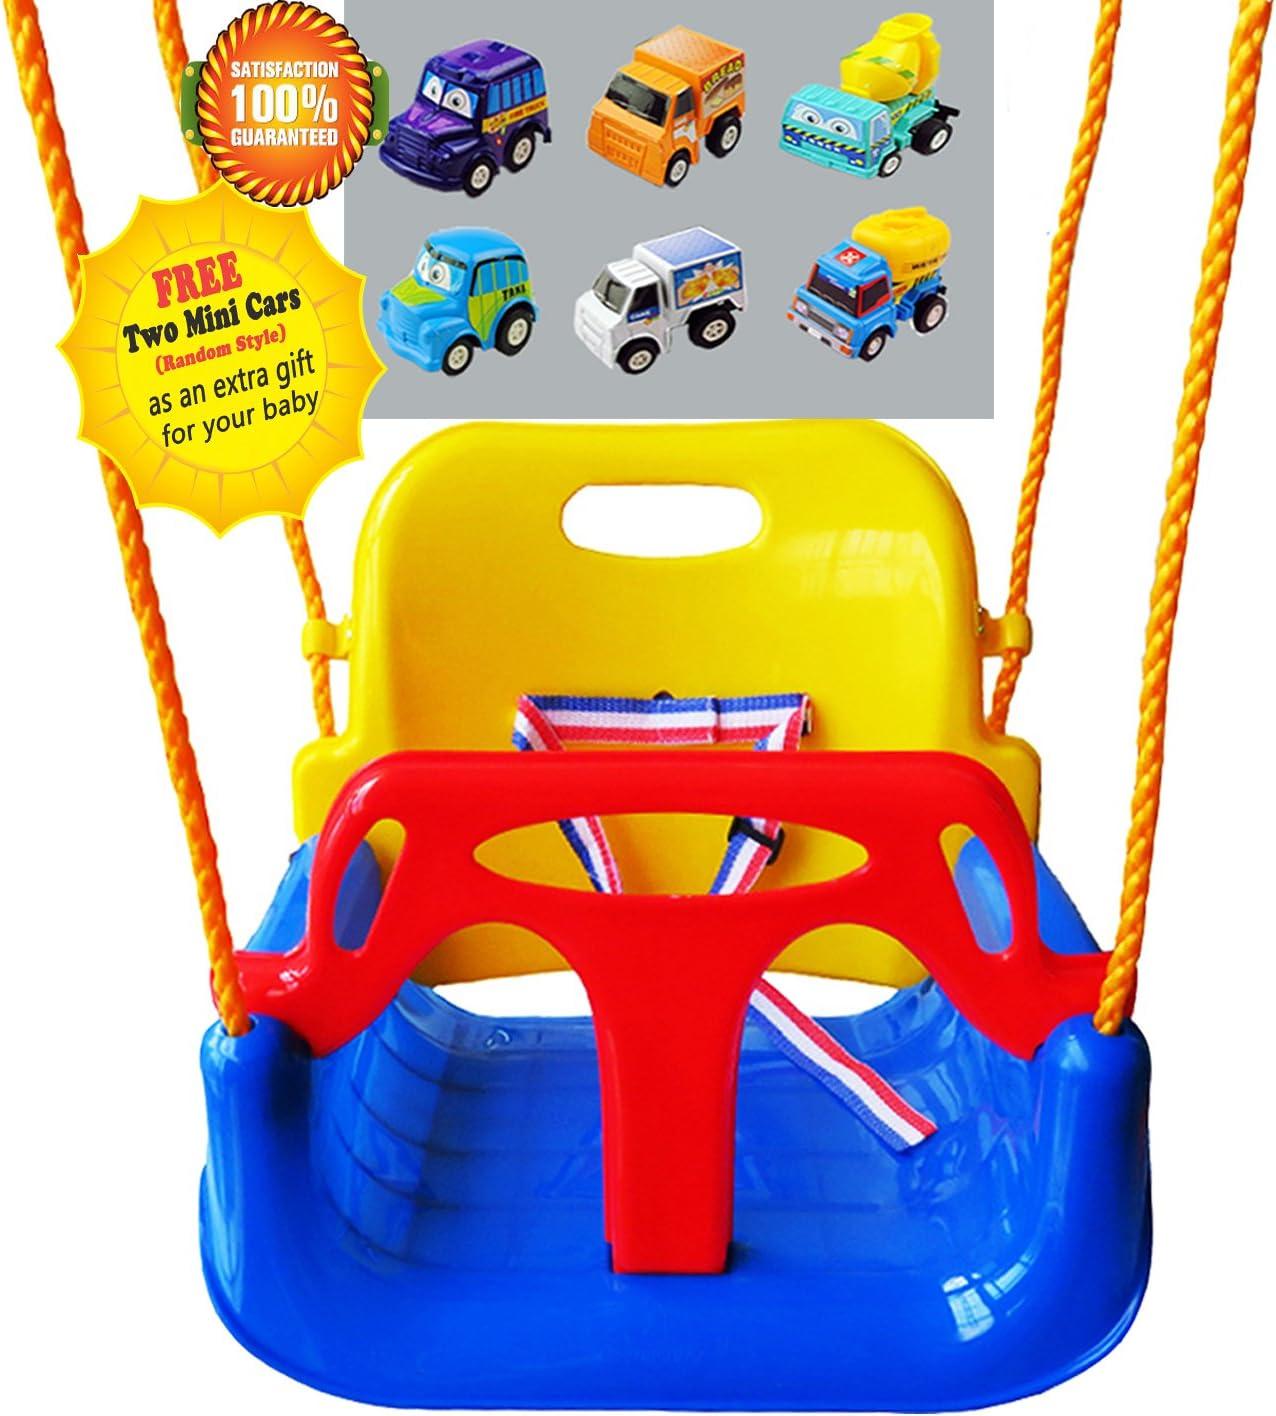 Littlefun 3-in-1 Infant to Toddler Upgrade Swing Anti-flip Snug & Secure Detachable Children Outdoor Play Patio Garden Amusement Park Equipment Bonus Mini Cars Gifts(Color:Blue Chair)